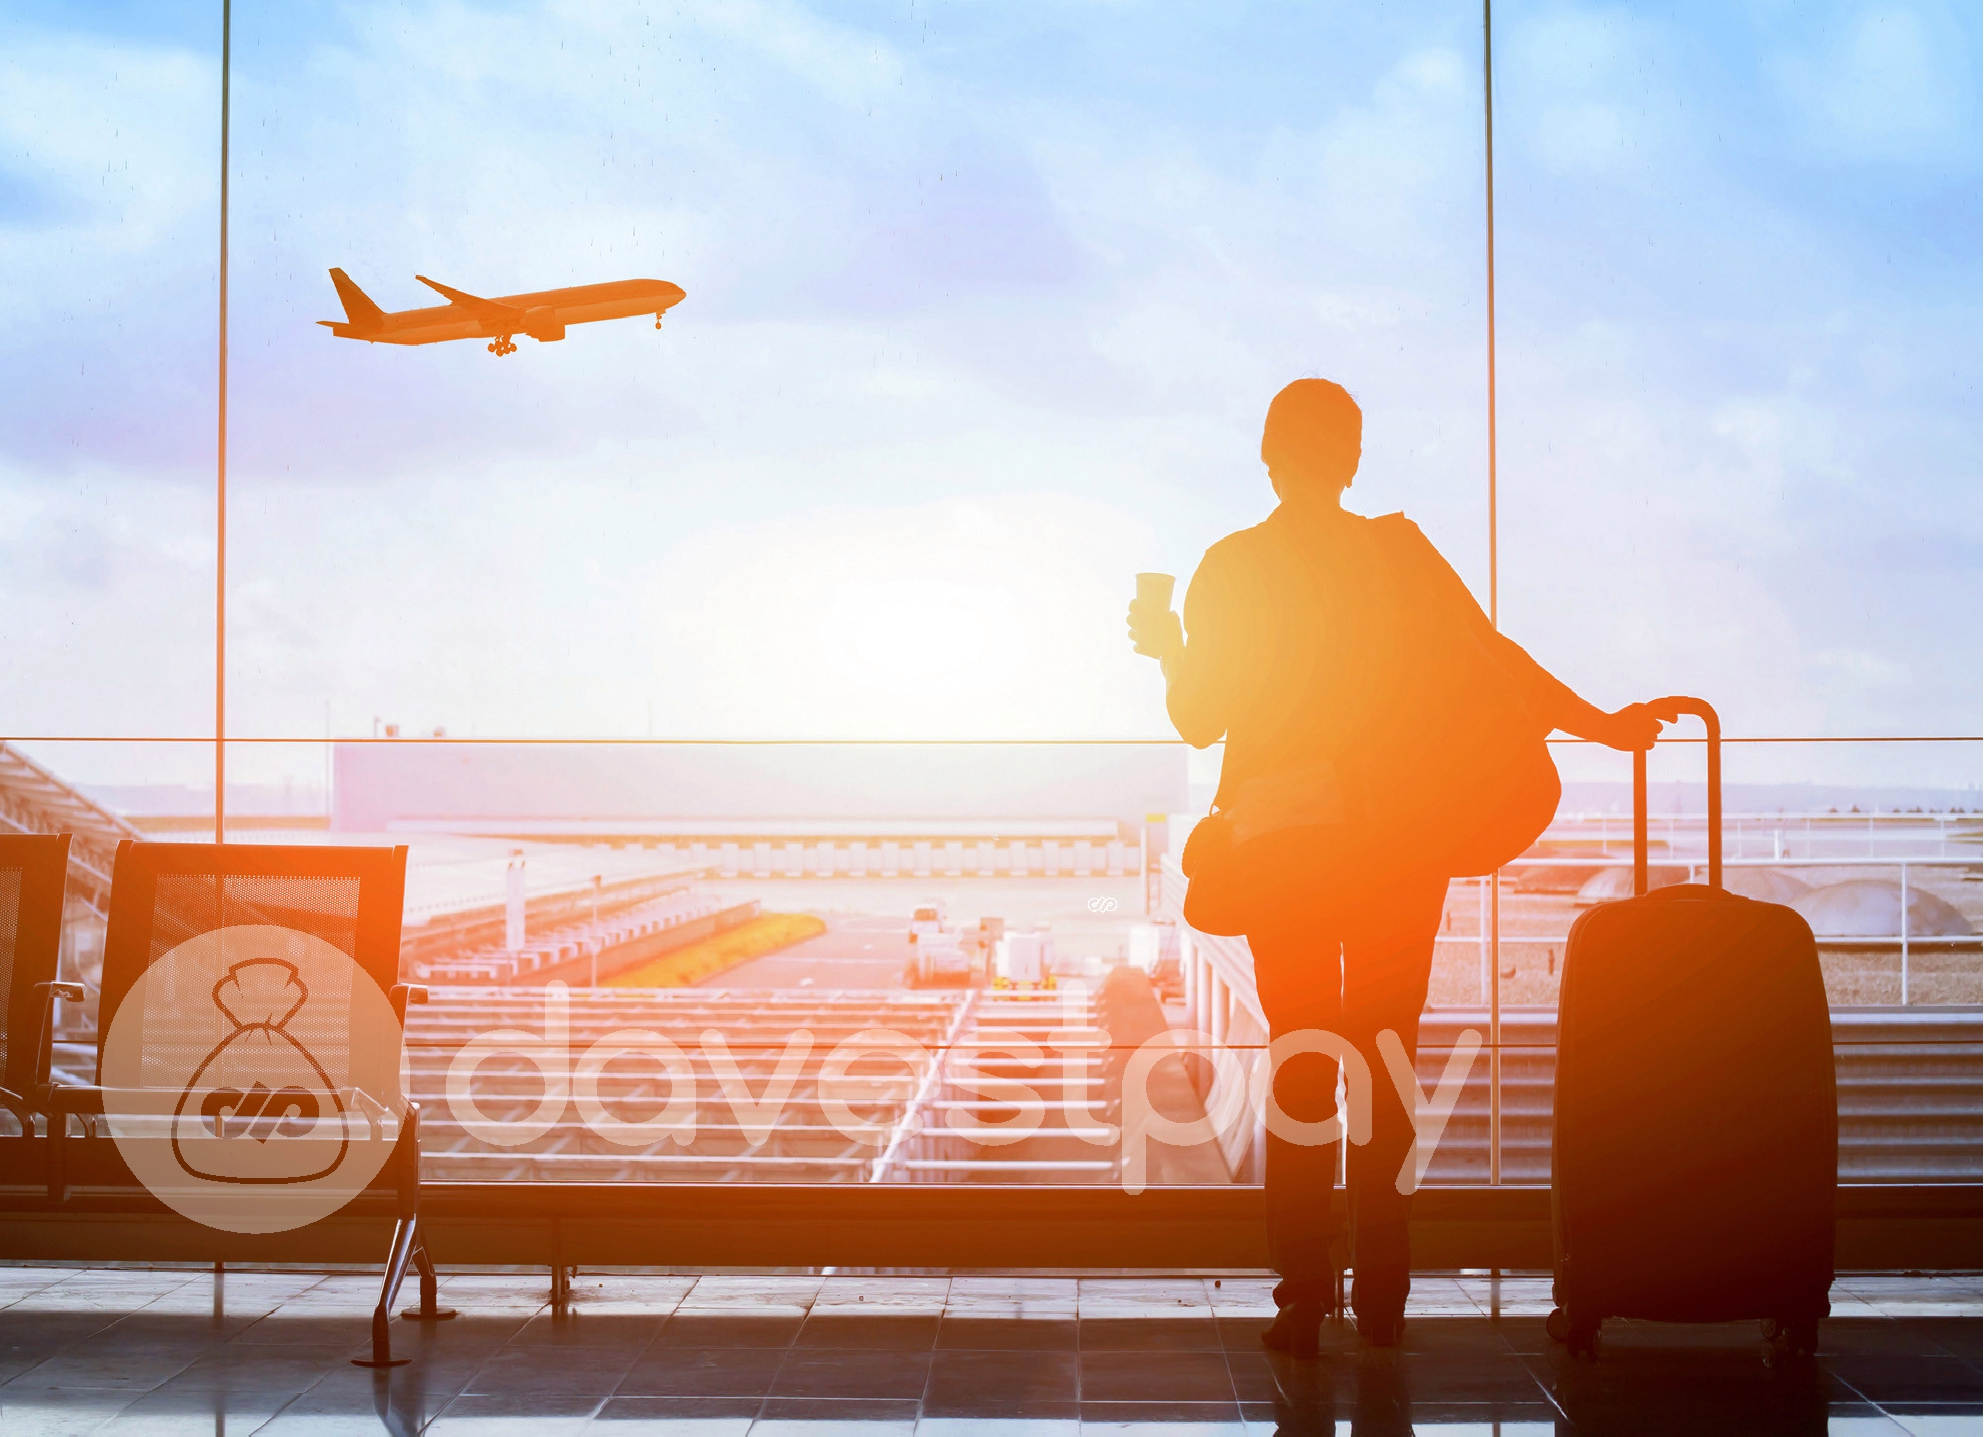 Simak Lokasi Pilihan Wisata Resolusi Tahun 2019 Versi DavestPay